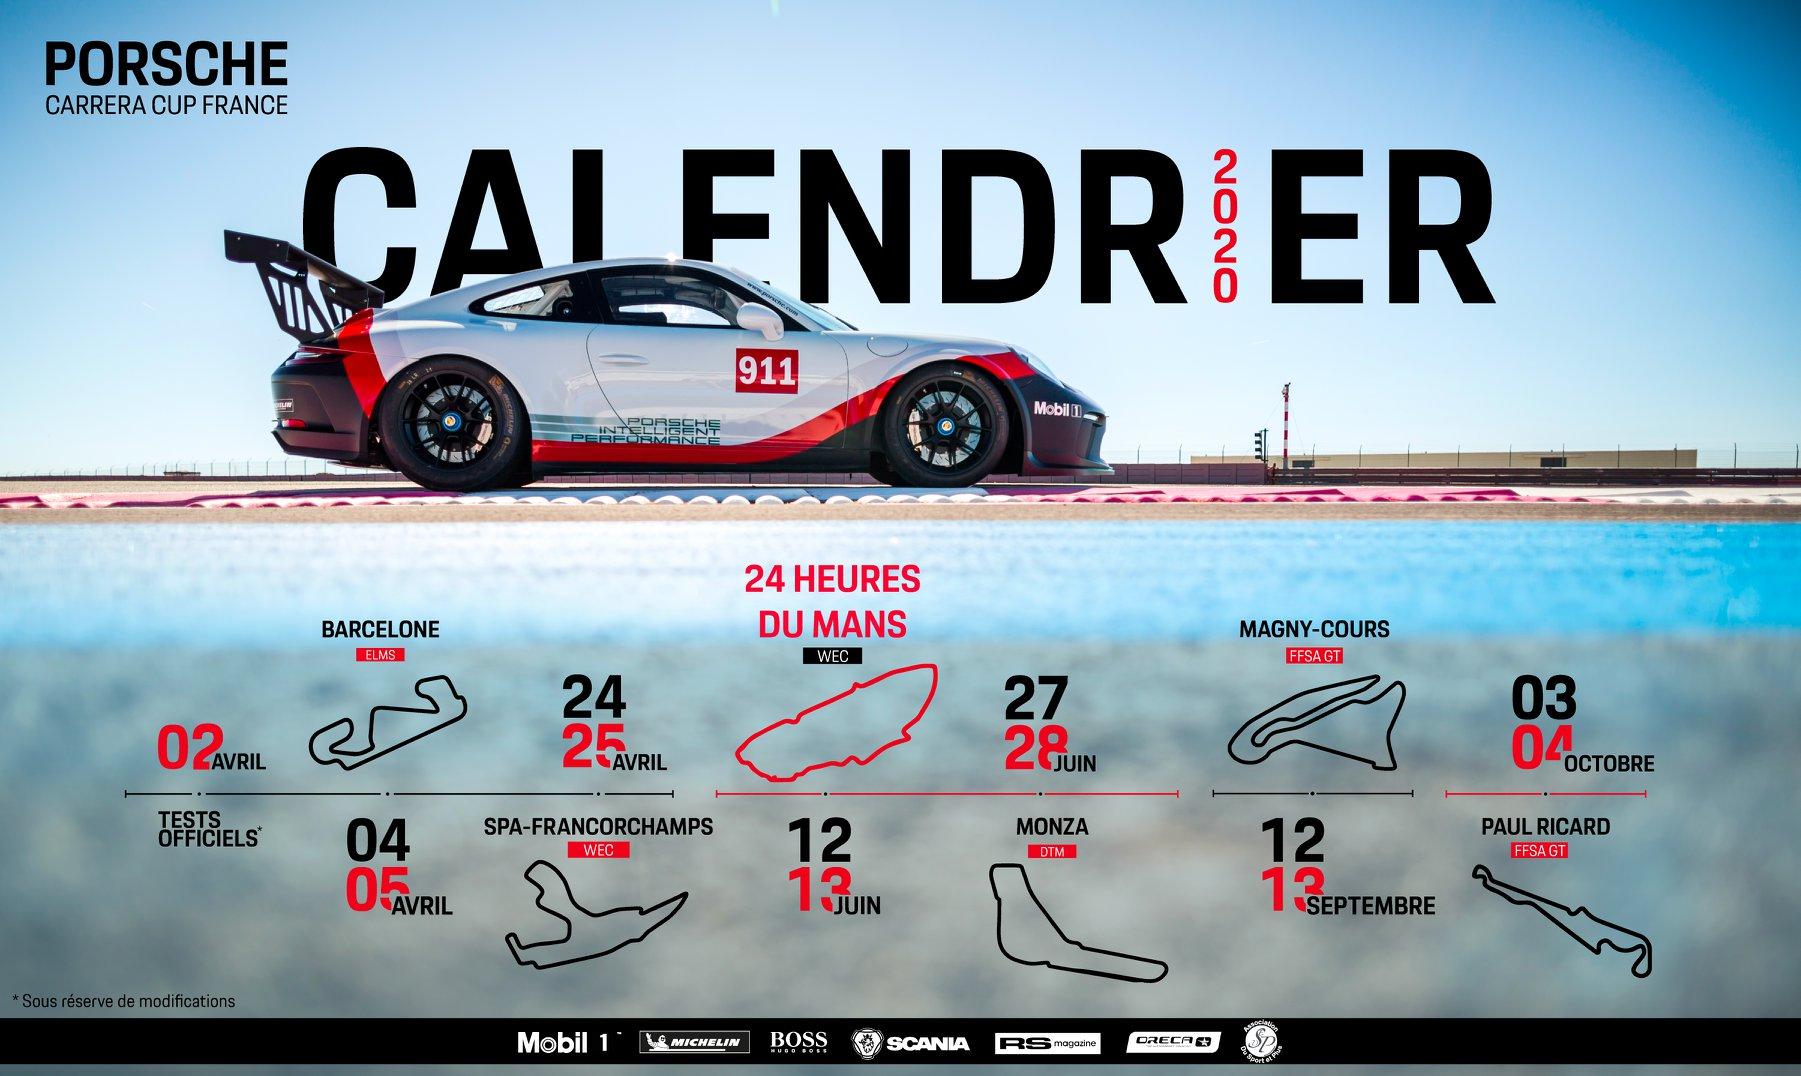 Calendrier Magny Cours 2020.Un Calendrier Cinq Etoiles Pour La Porsche Carrera Cup